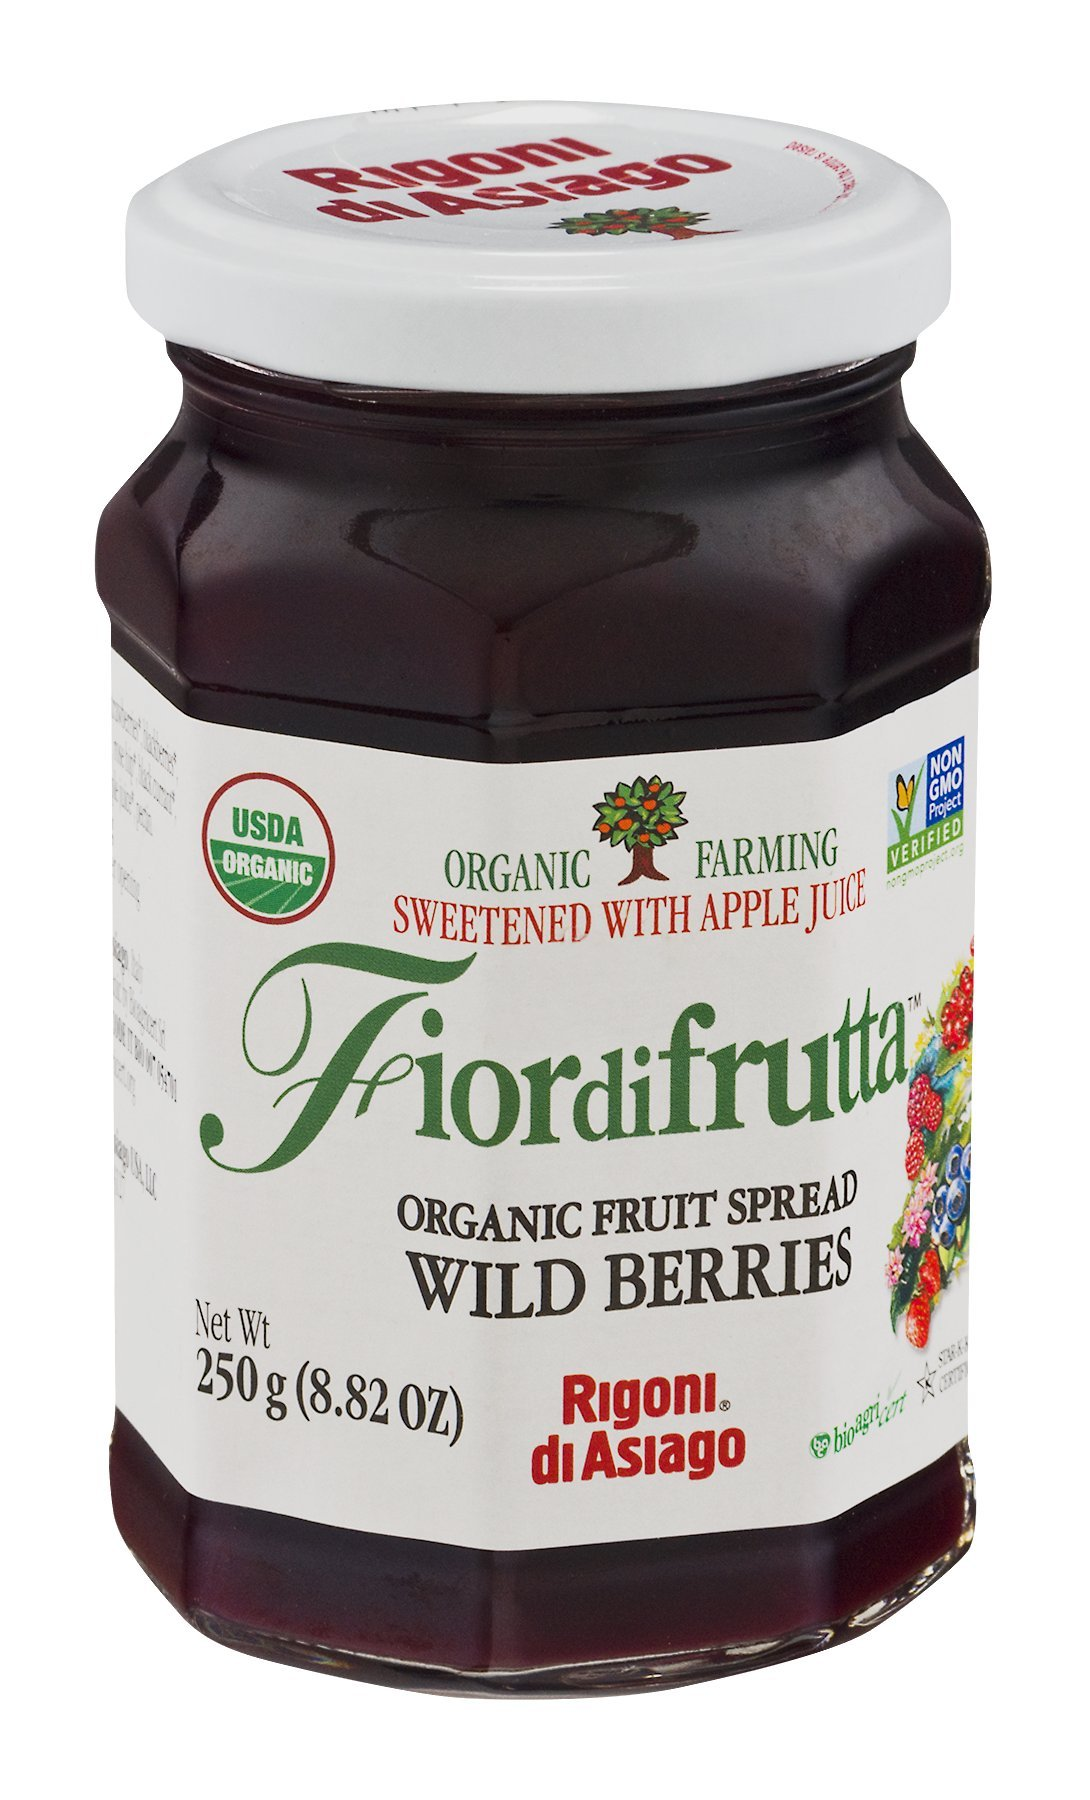 Fiordifrutta Organic Fruit Spread Wild Berries 8.82 OZ (Pack of 18)